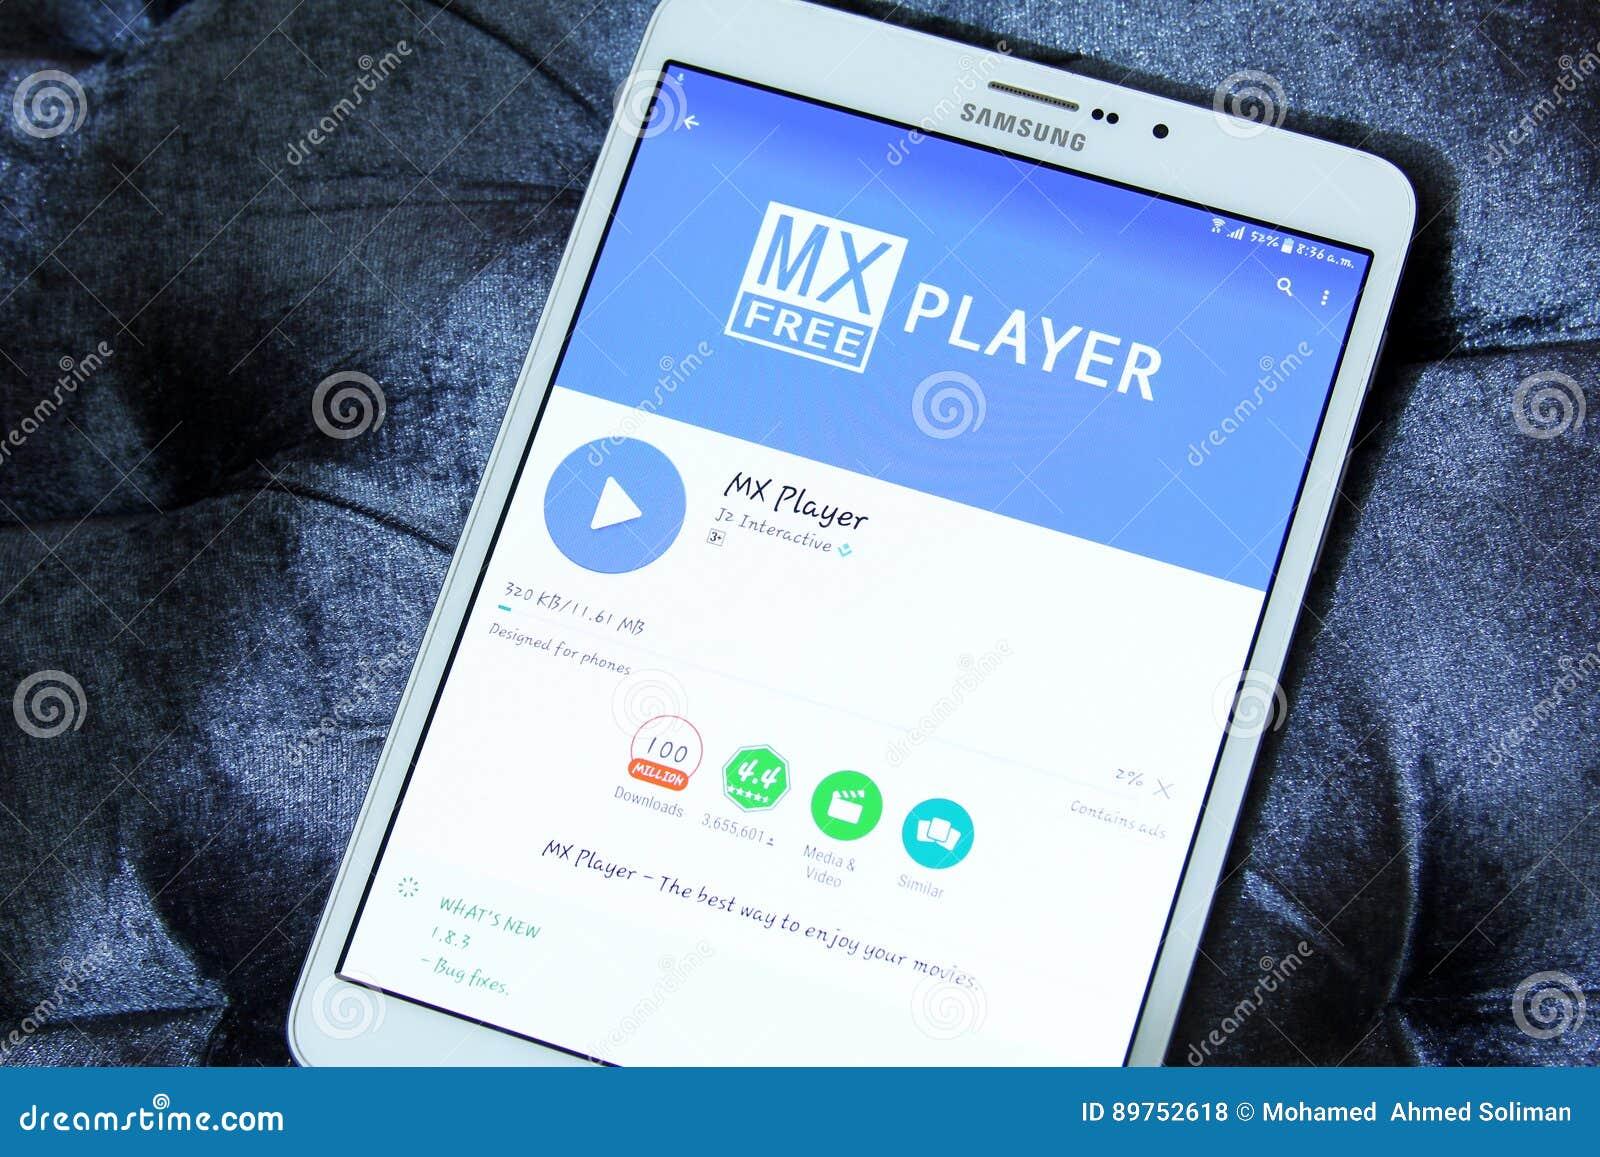 Mx player app editorial stock photo  Image of emblem - 89752618